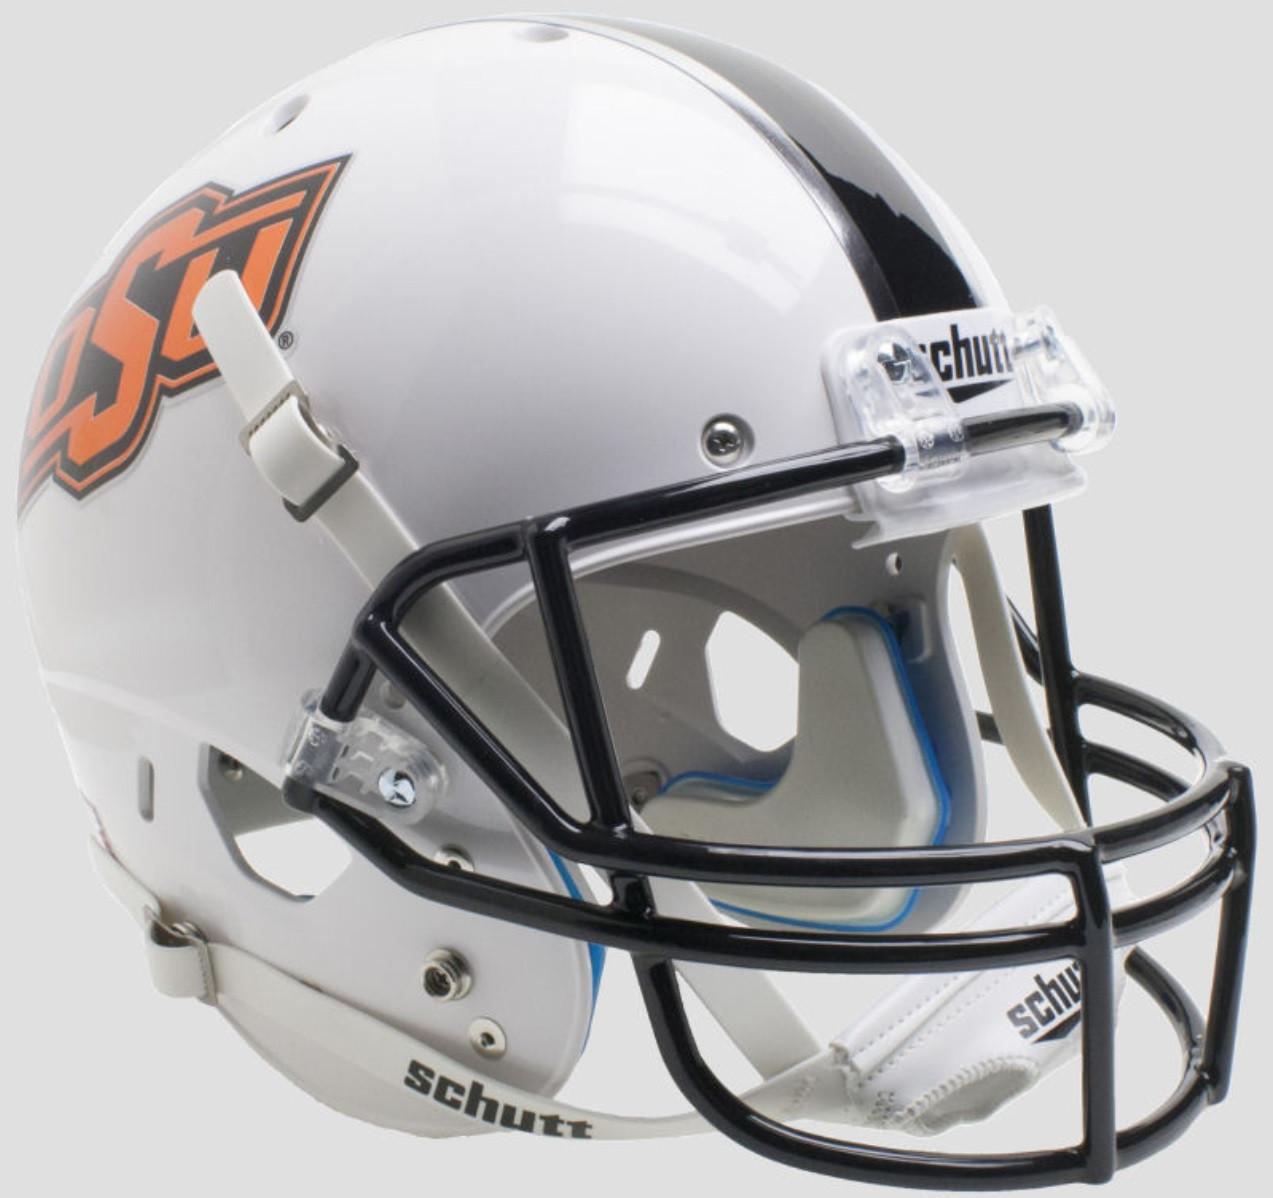 finest selection 08119 4478e Oklahoma State Cowboys White with Chrome OSU logo Schutt Full Size Replica  Football Helmet